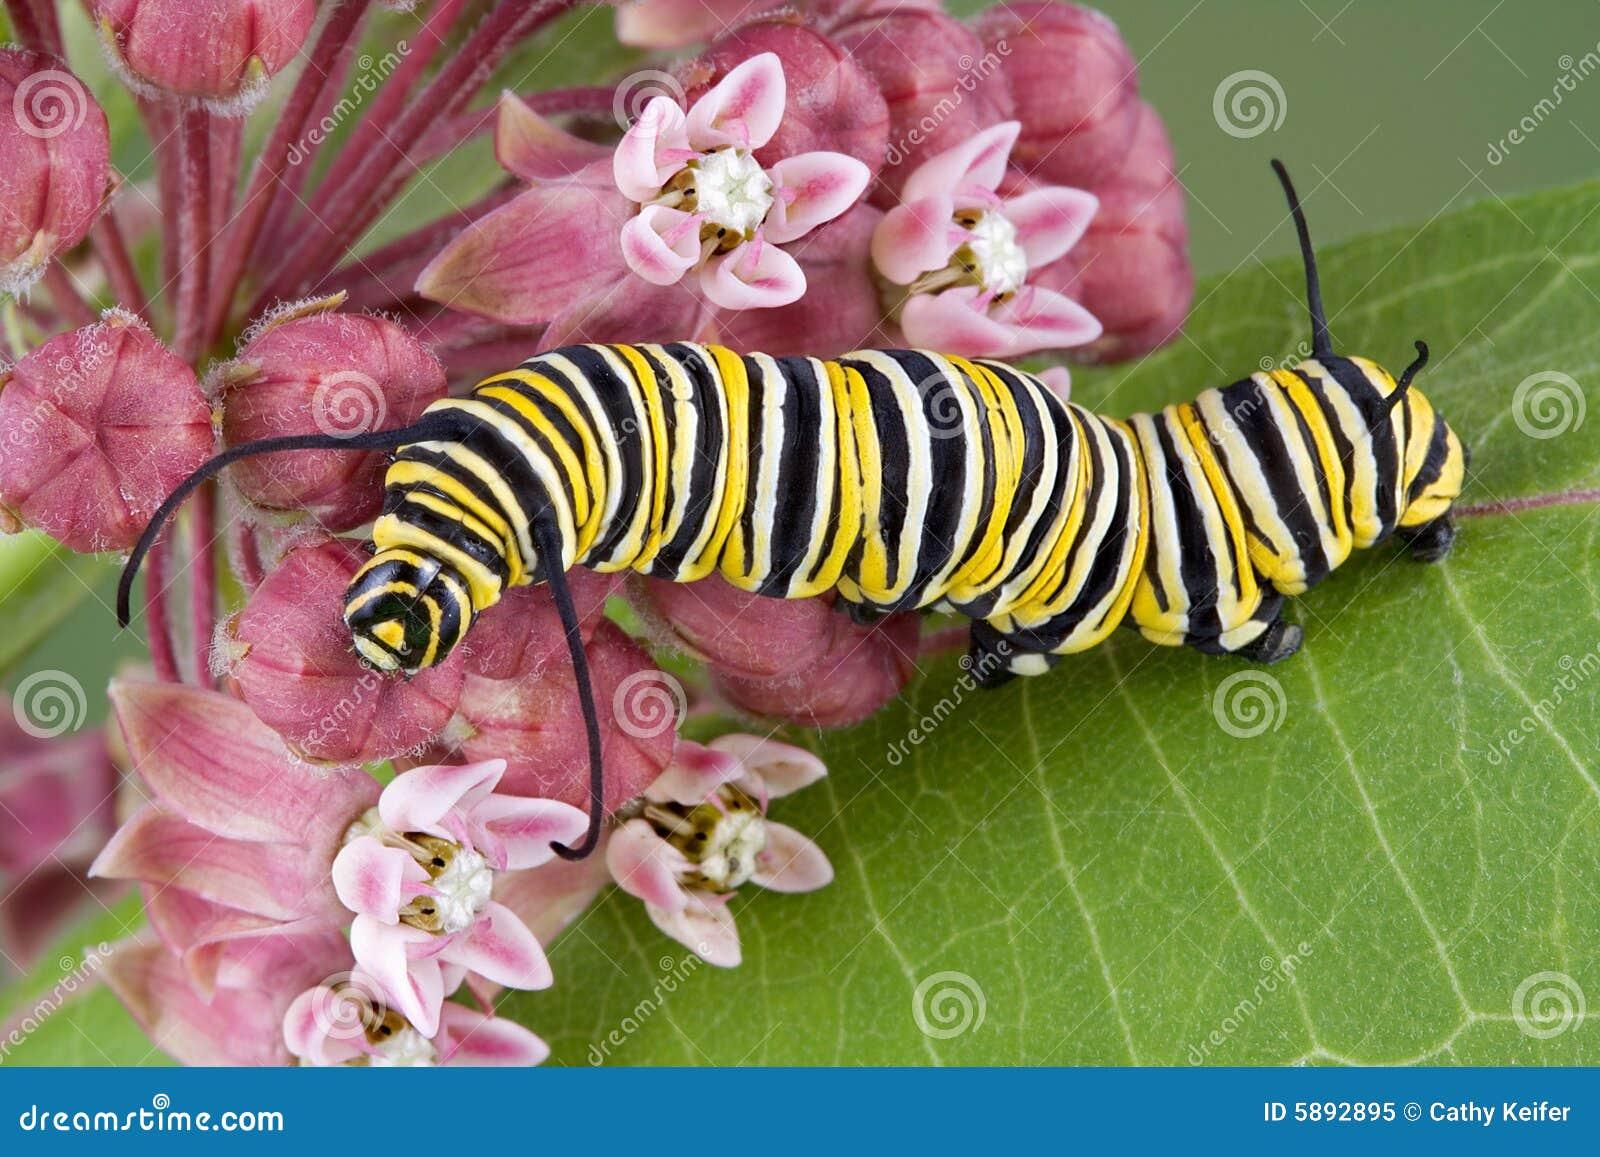 Monarch caterpillar on milkweed c